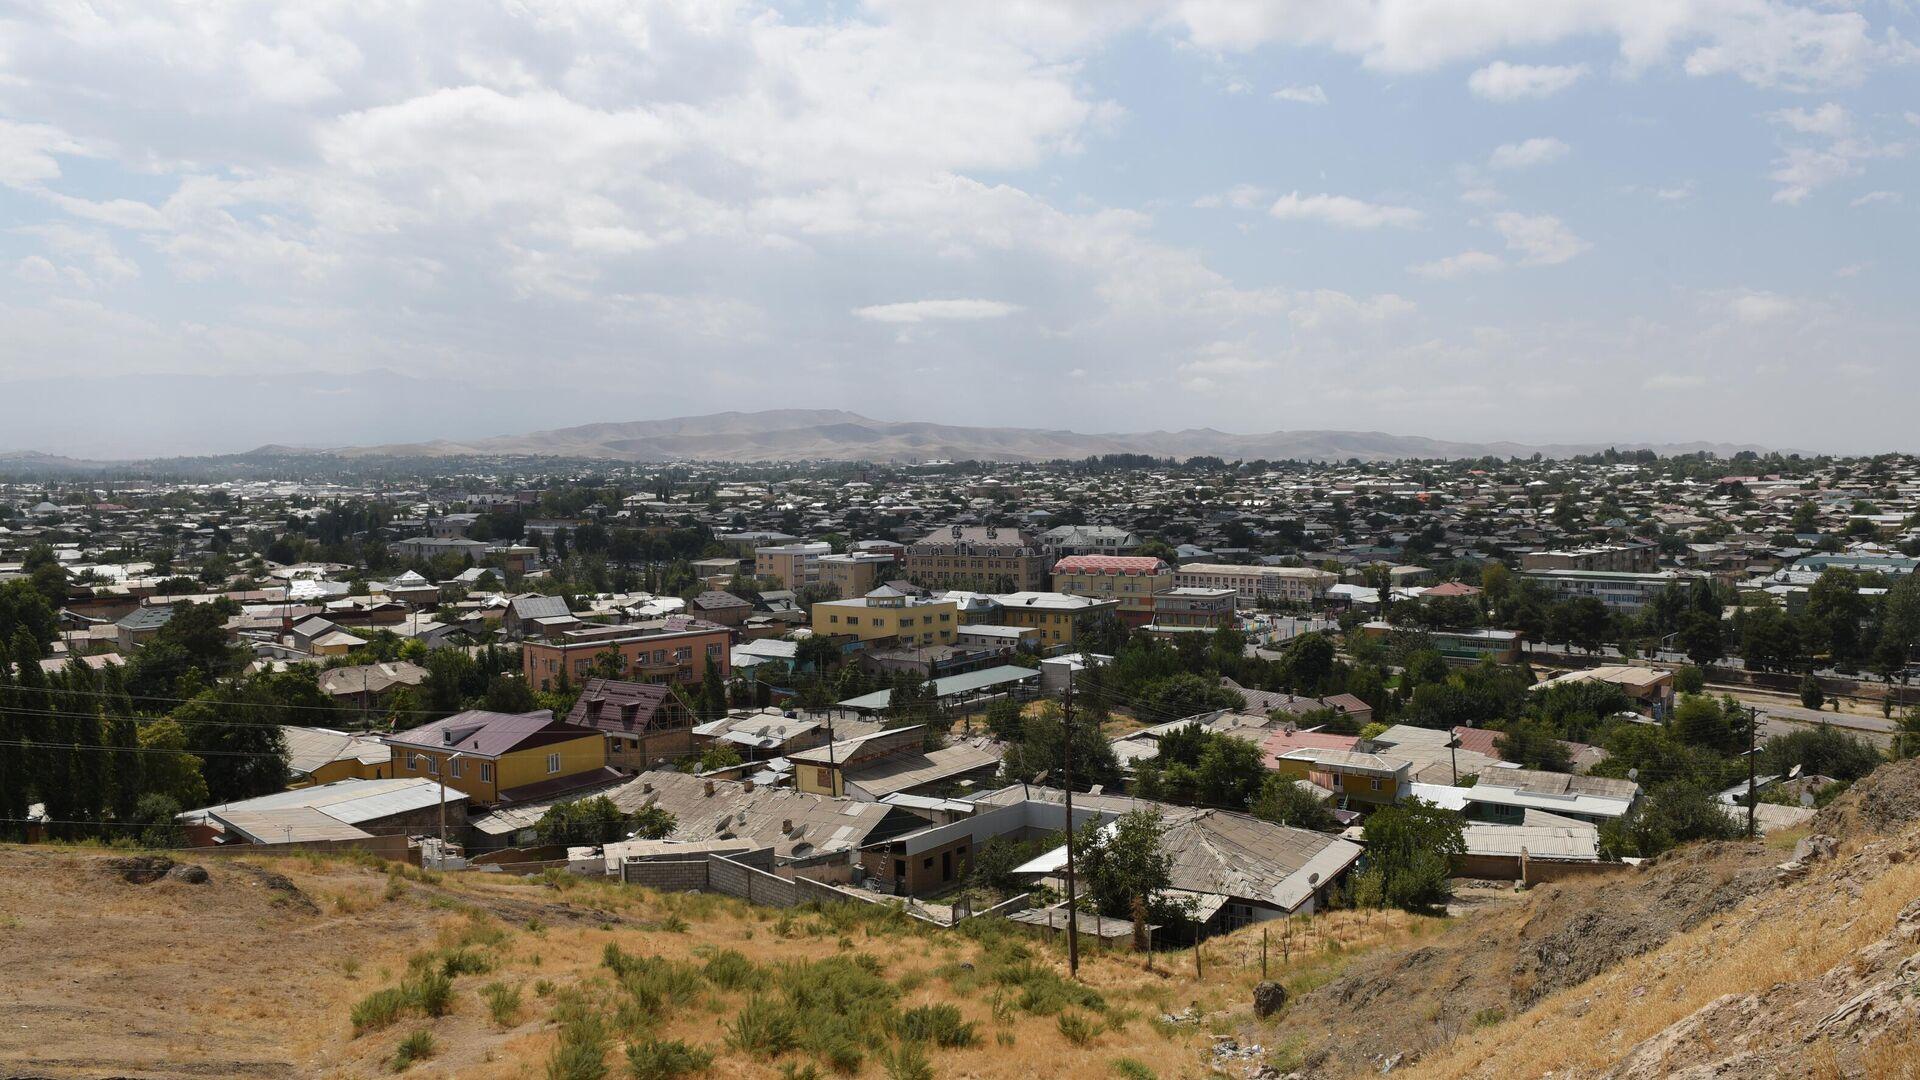 Вид на город Истаравшан в Таджикистане - РИА Новости, 1920, 05.07.2021